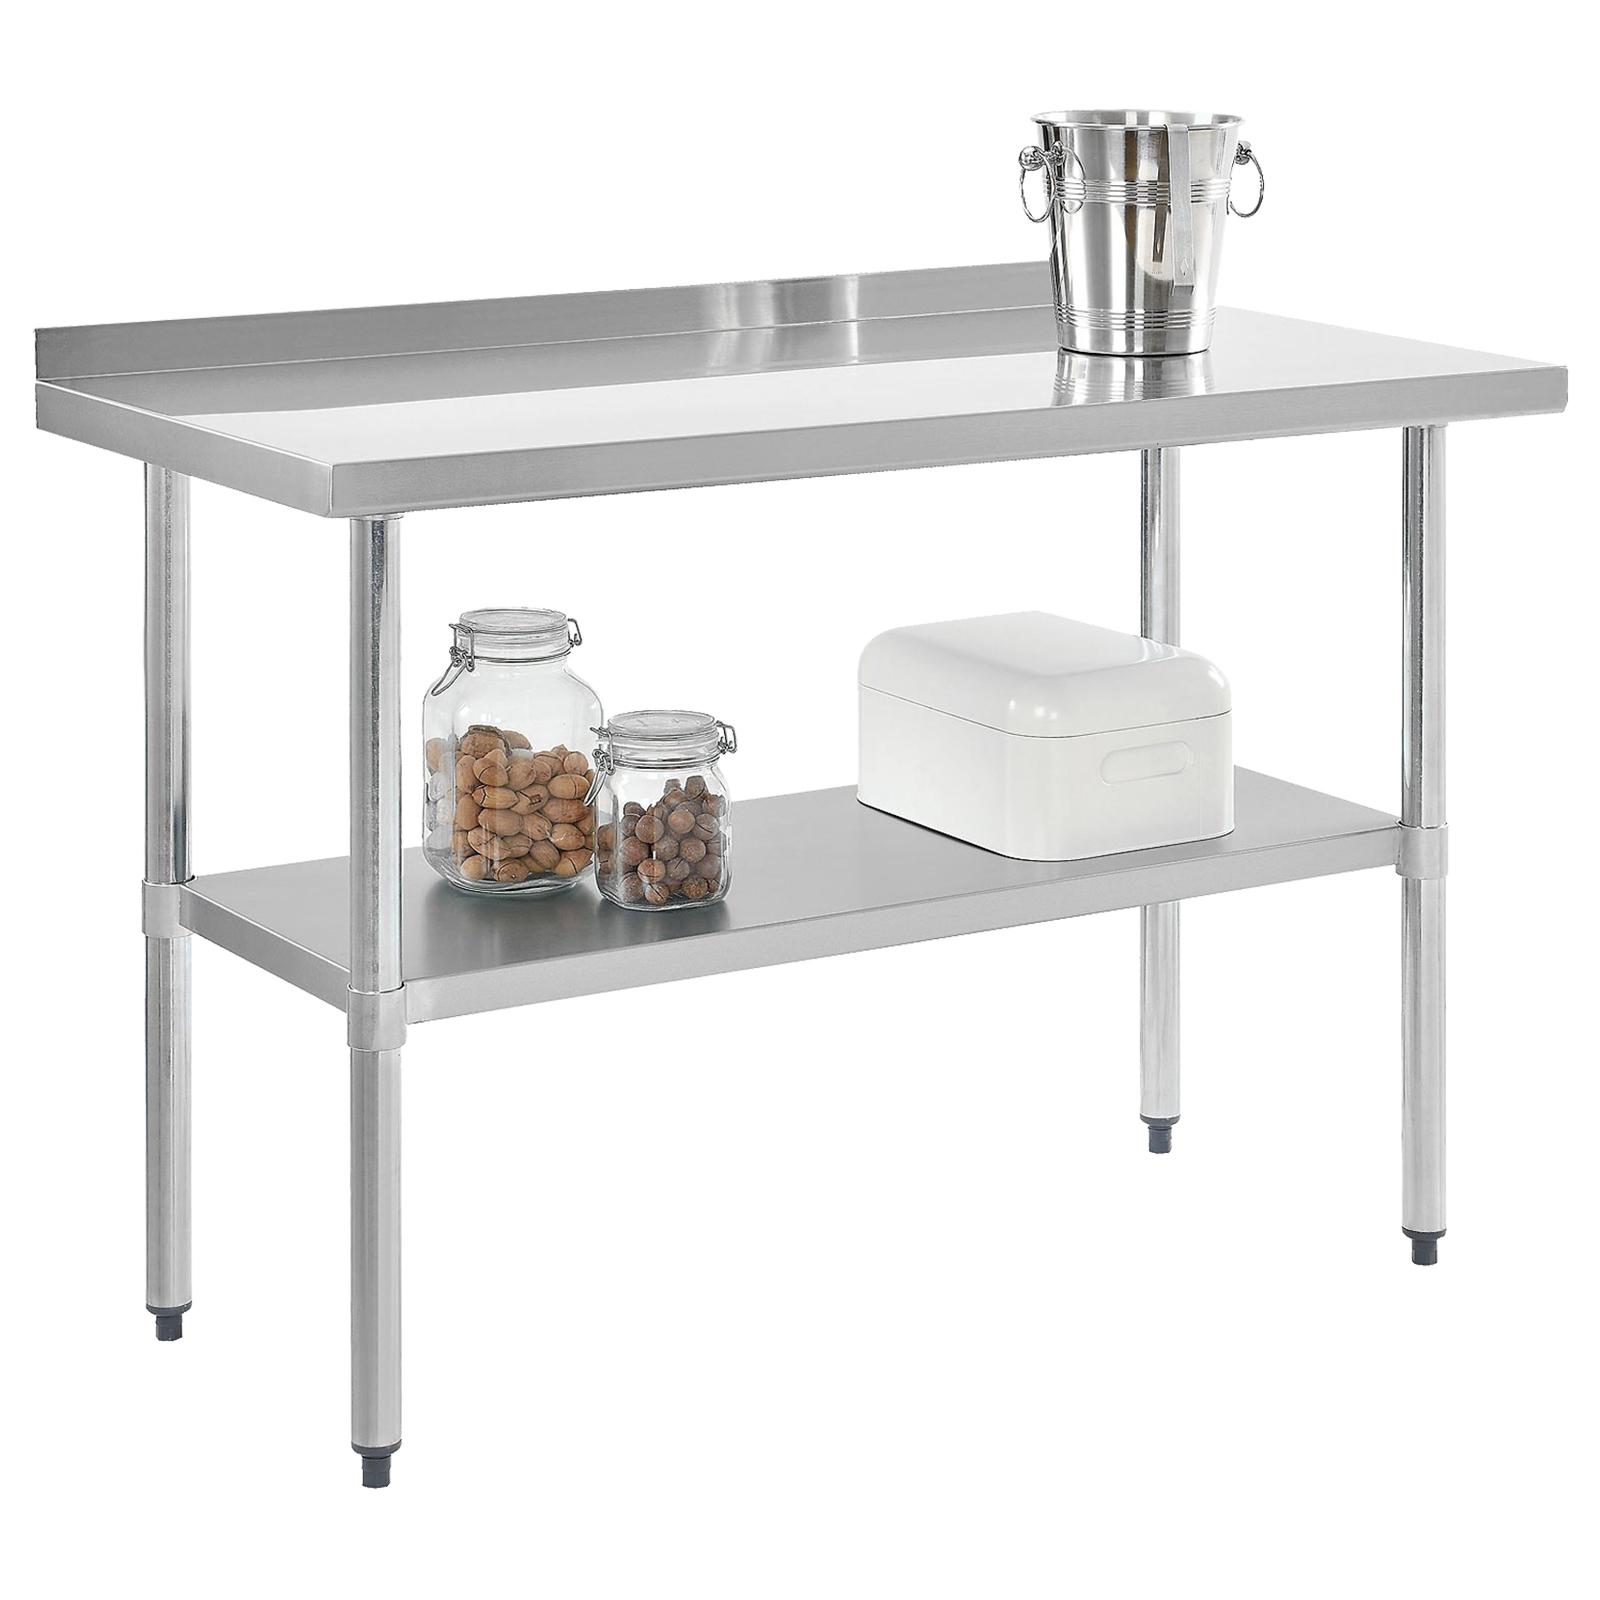 NEXEL WB7230BSS work table,  63